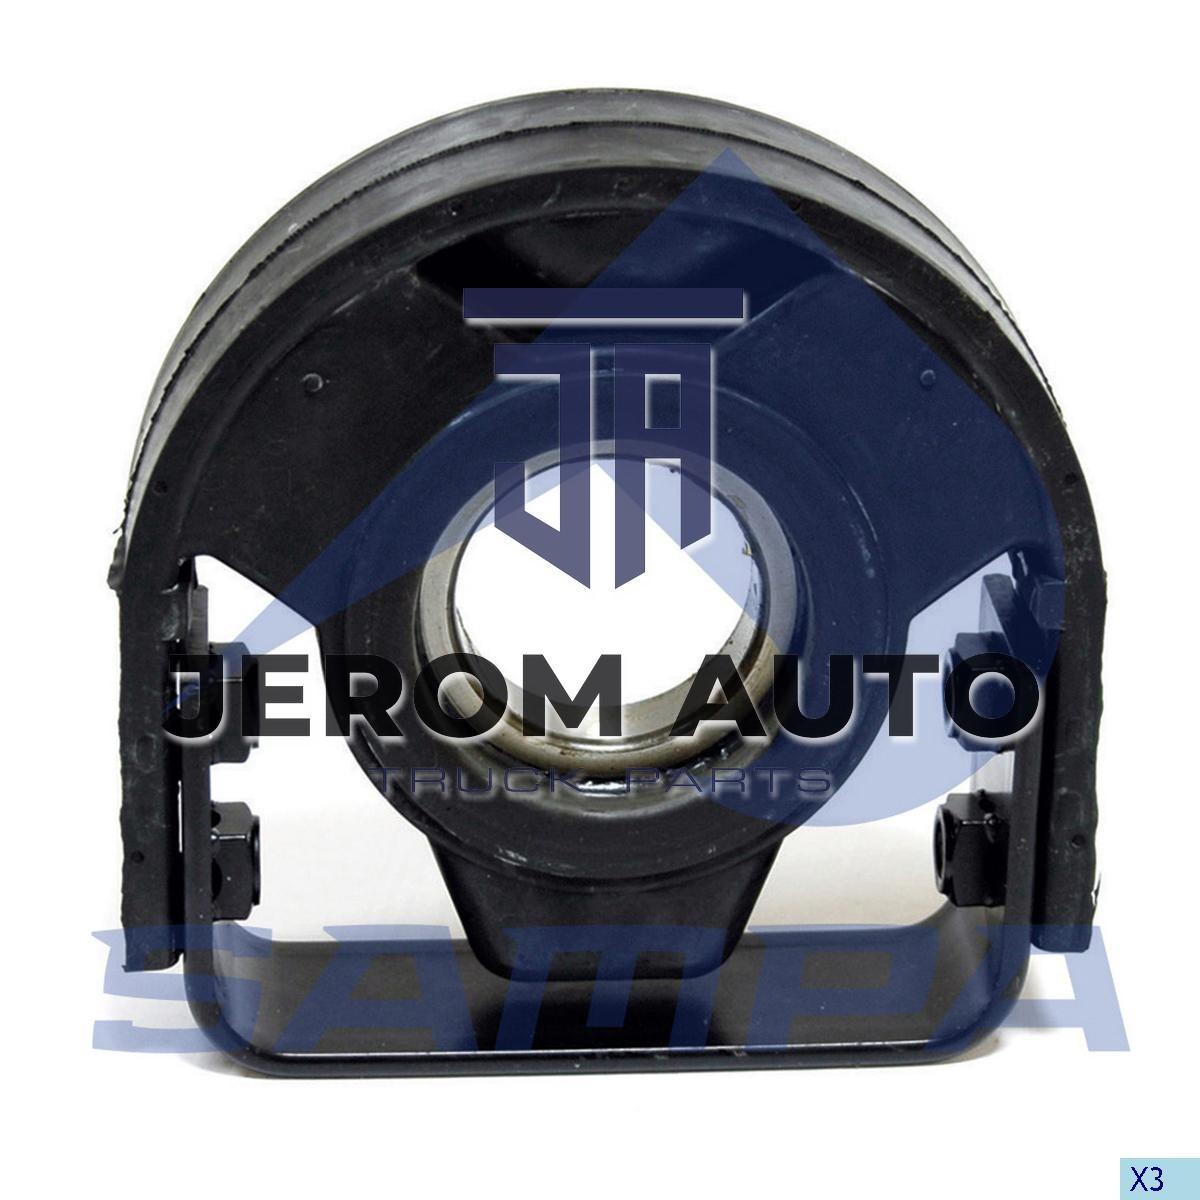 Подвесной подшипник (d=60мм) Mercedes \6544110012 \ 011.275